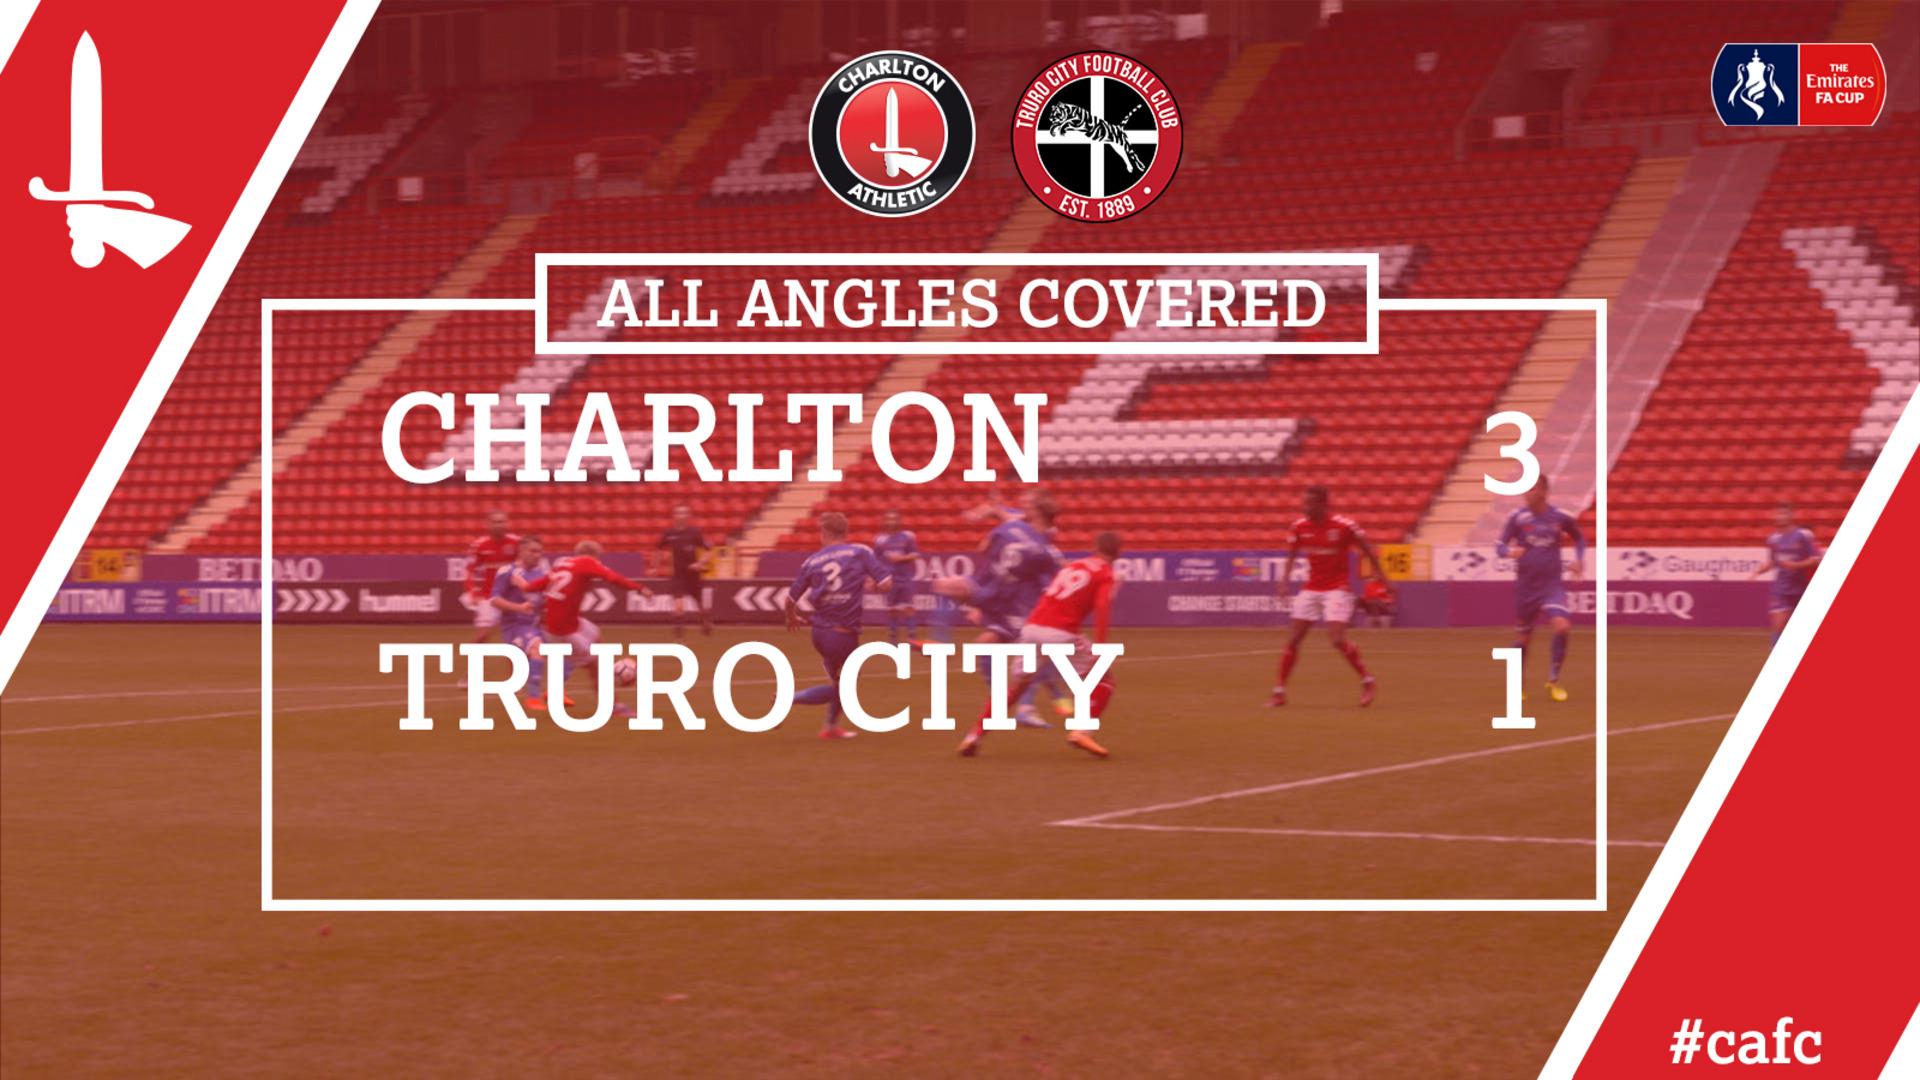 ALL ANGLES COVERED | Charlton 3 Truro City 1